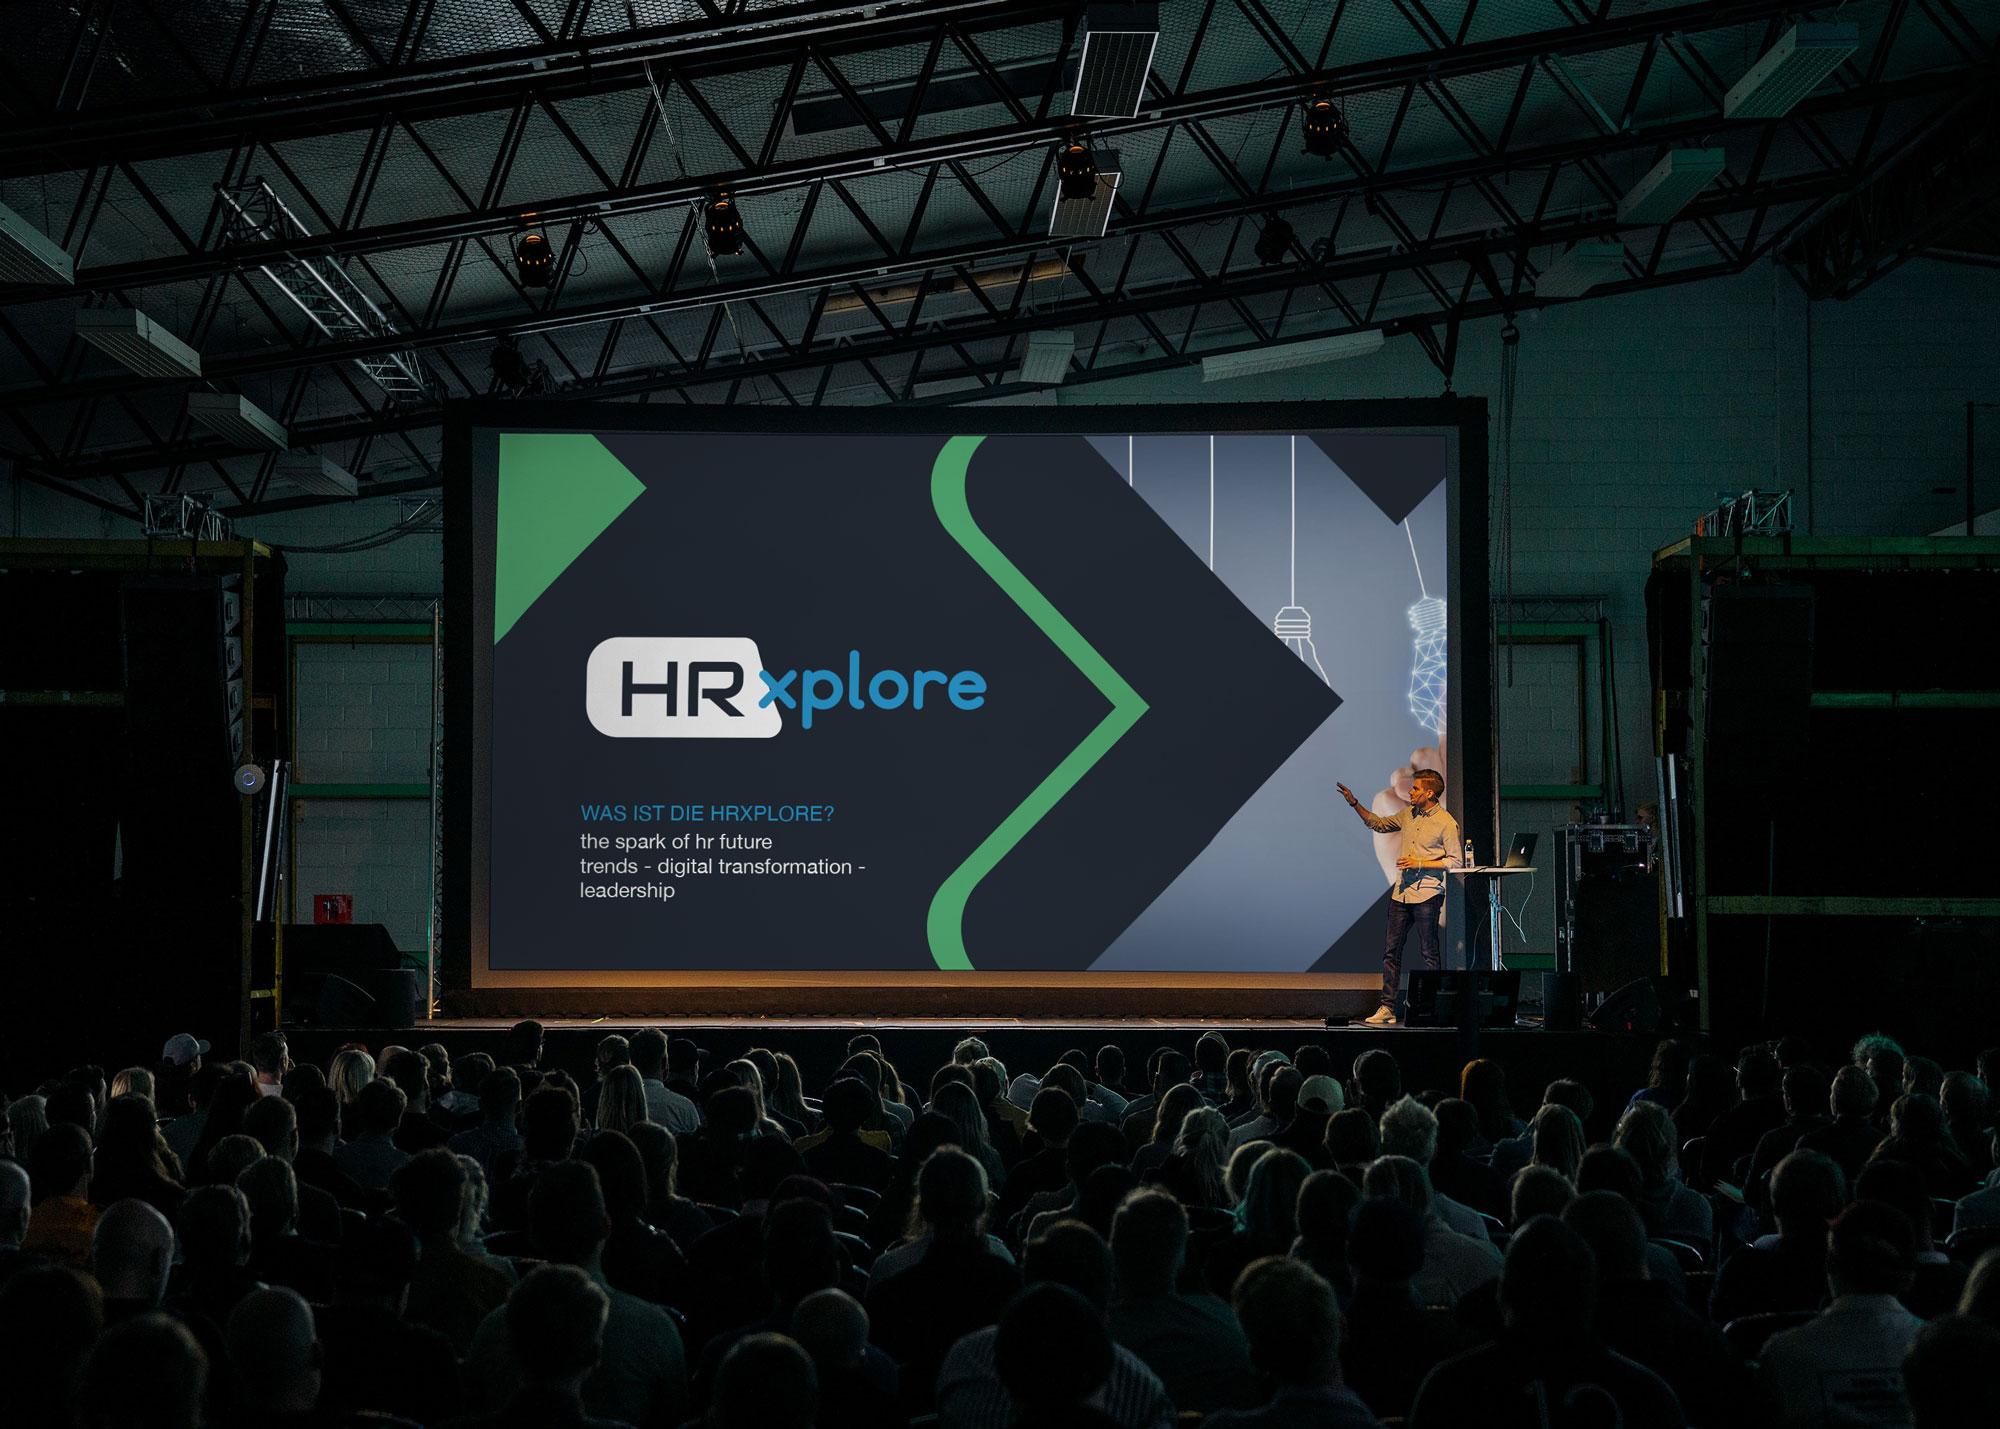 HRxplore Presäntation Design